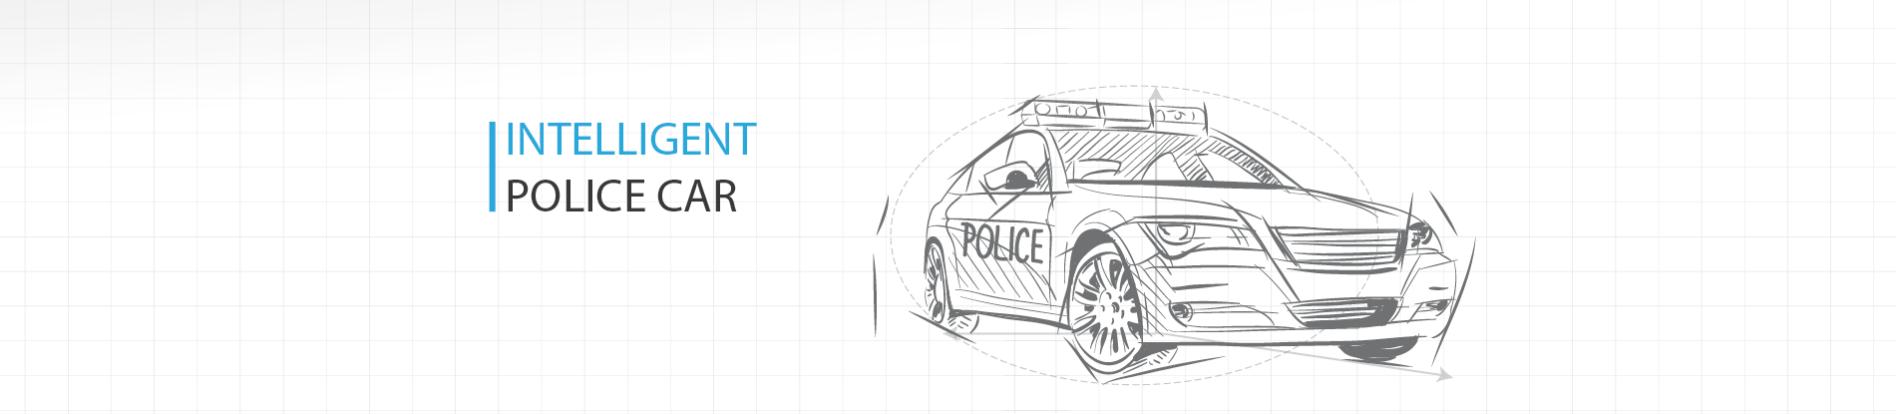 intelligent police car1